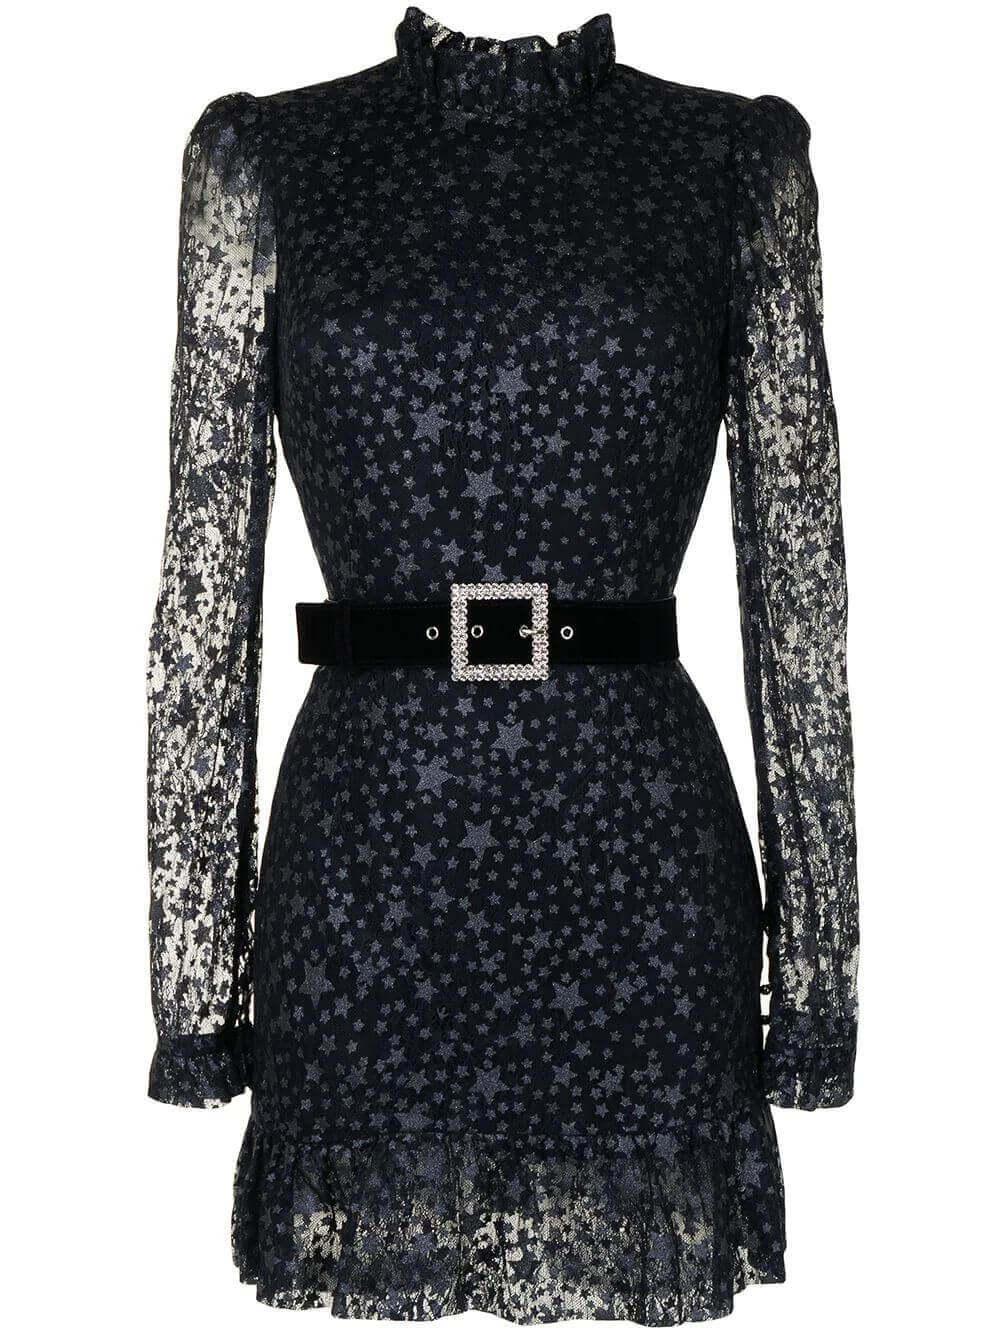 Celestine Mini Dress Item # 2103-1086